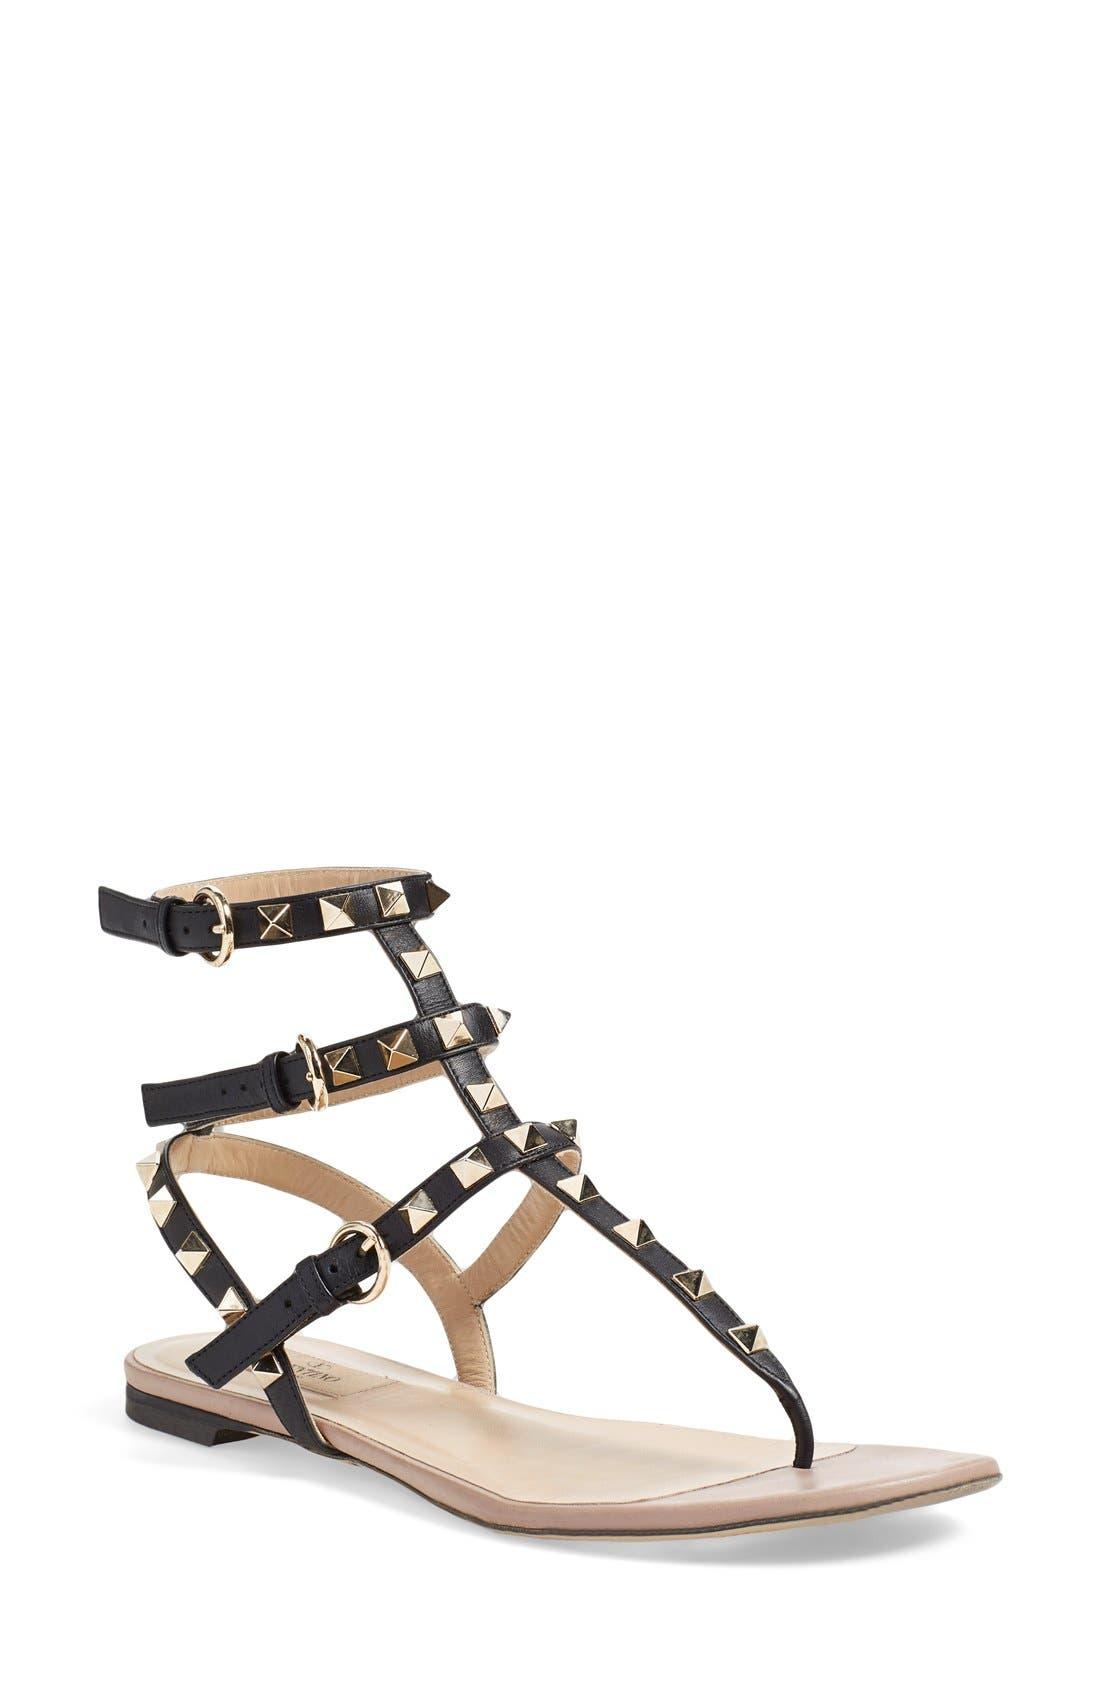 'Rockstud' Sandal,                             Main thumbnail 1, color,                             Black Leather